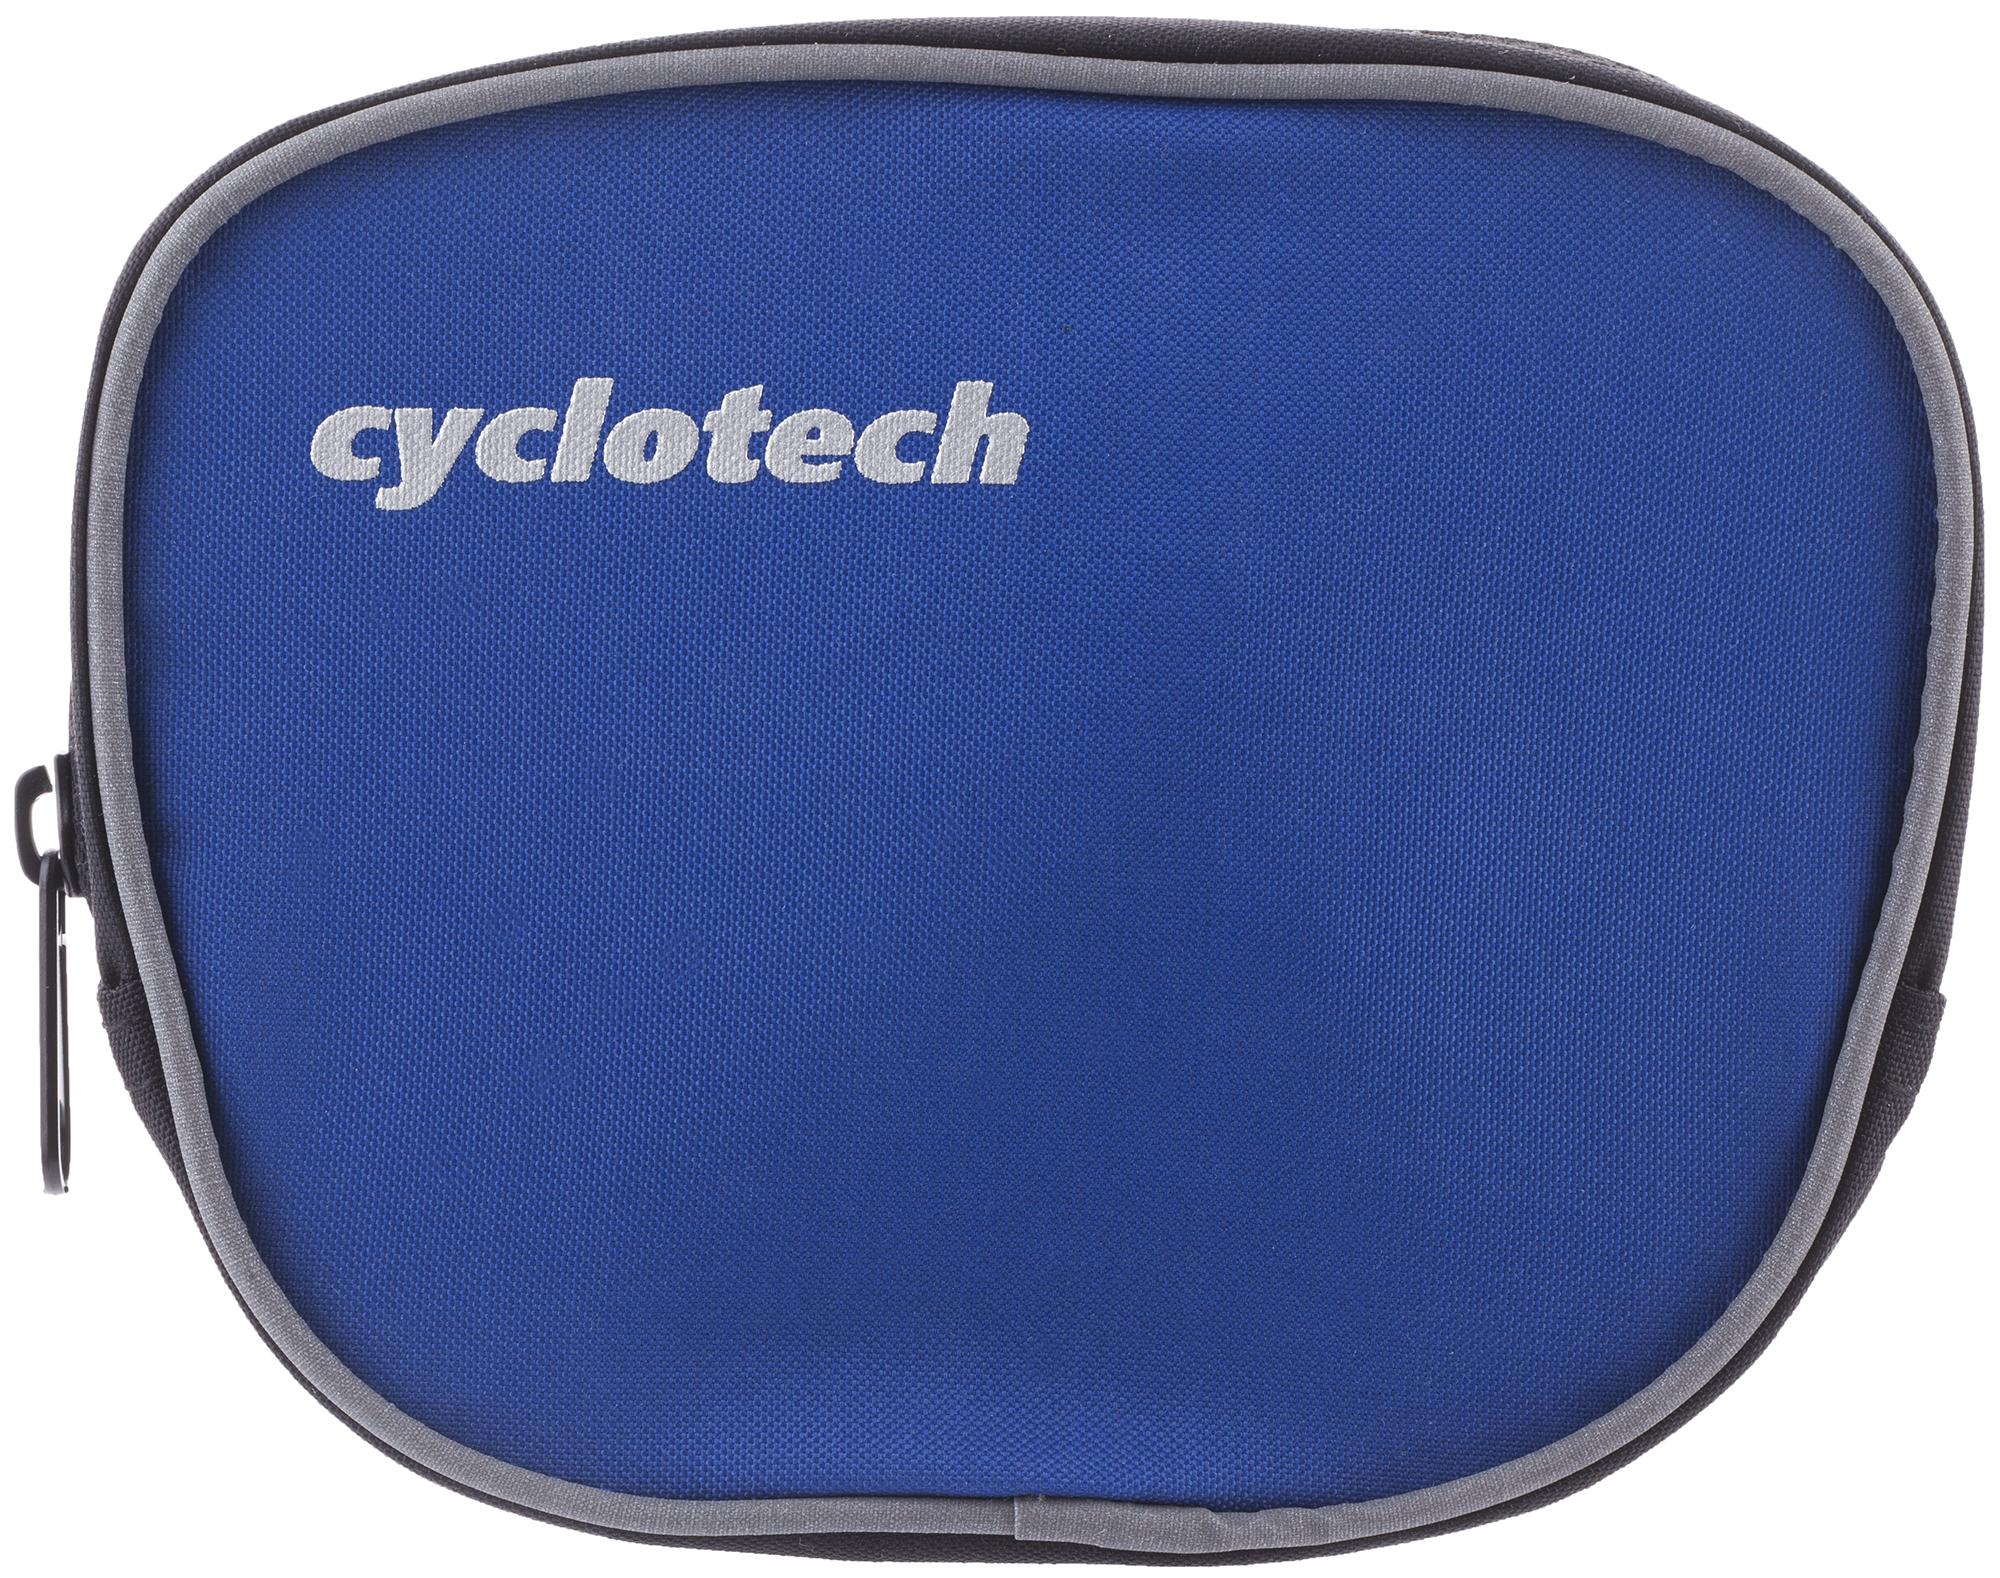 Cyclotech Велосипедная сумка Cyclotech машинка для чистки цепи cyclotech cyclotech